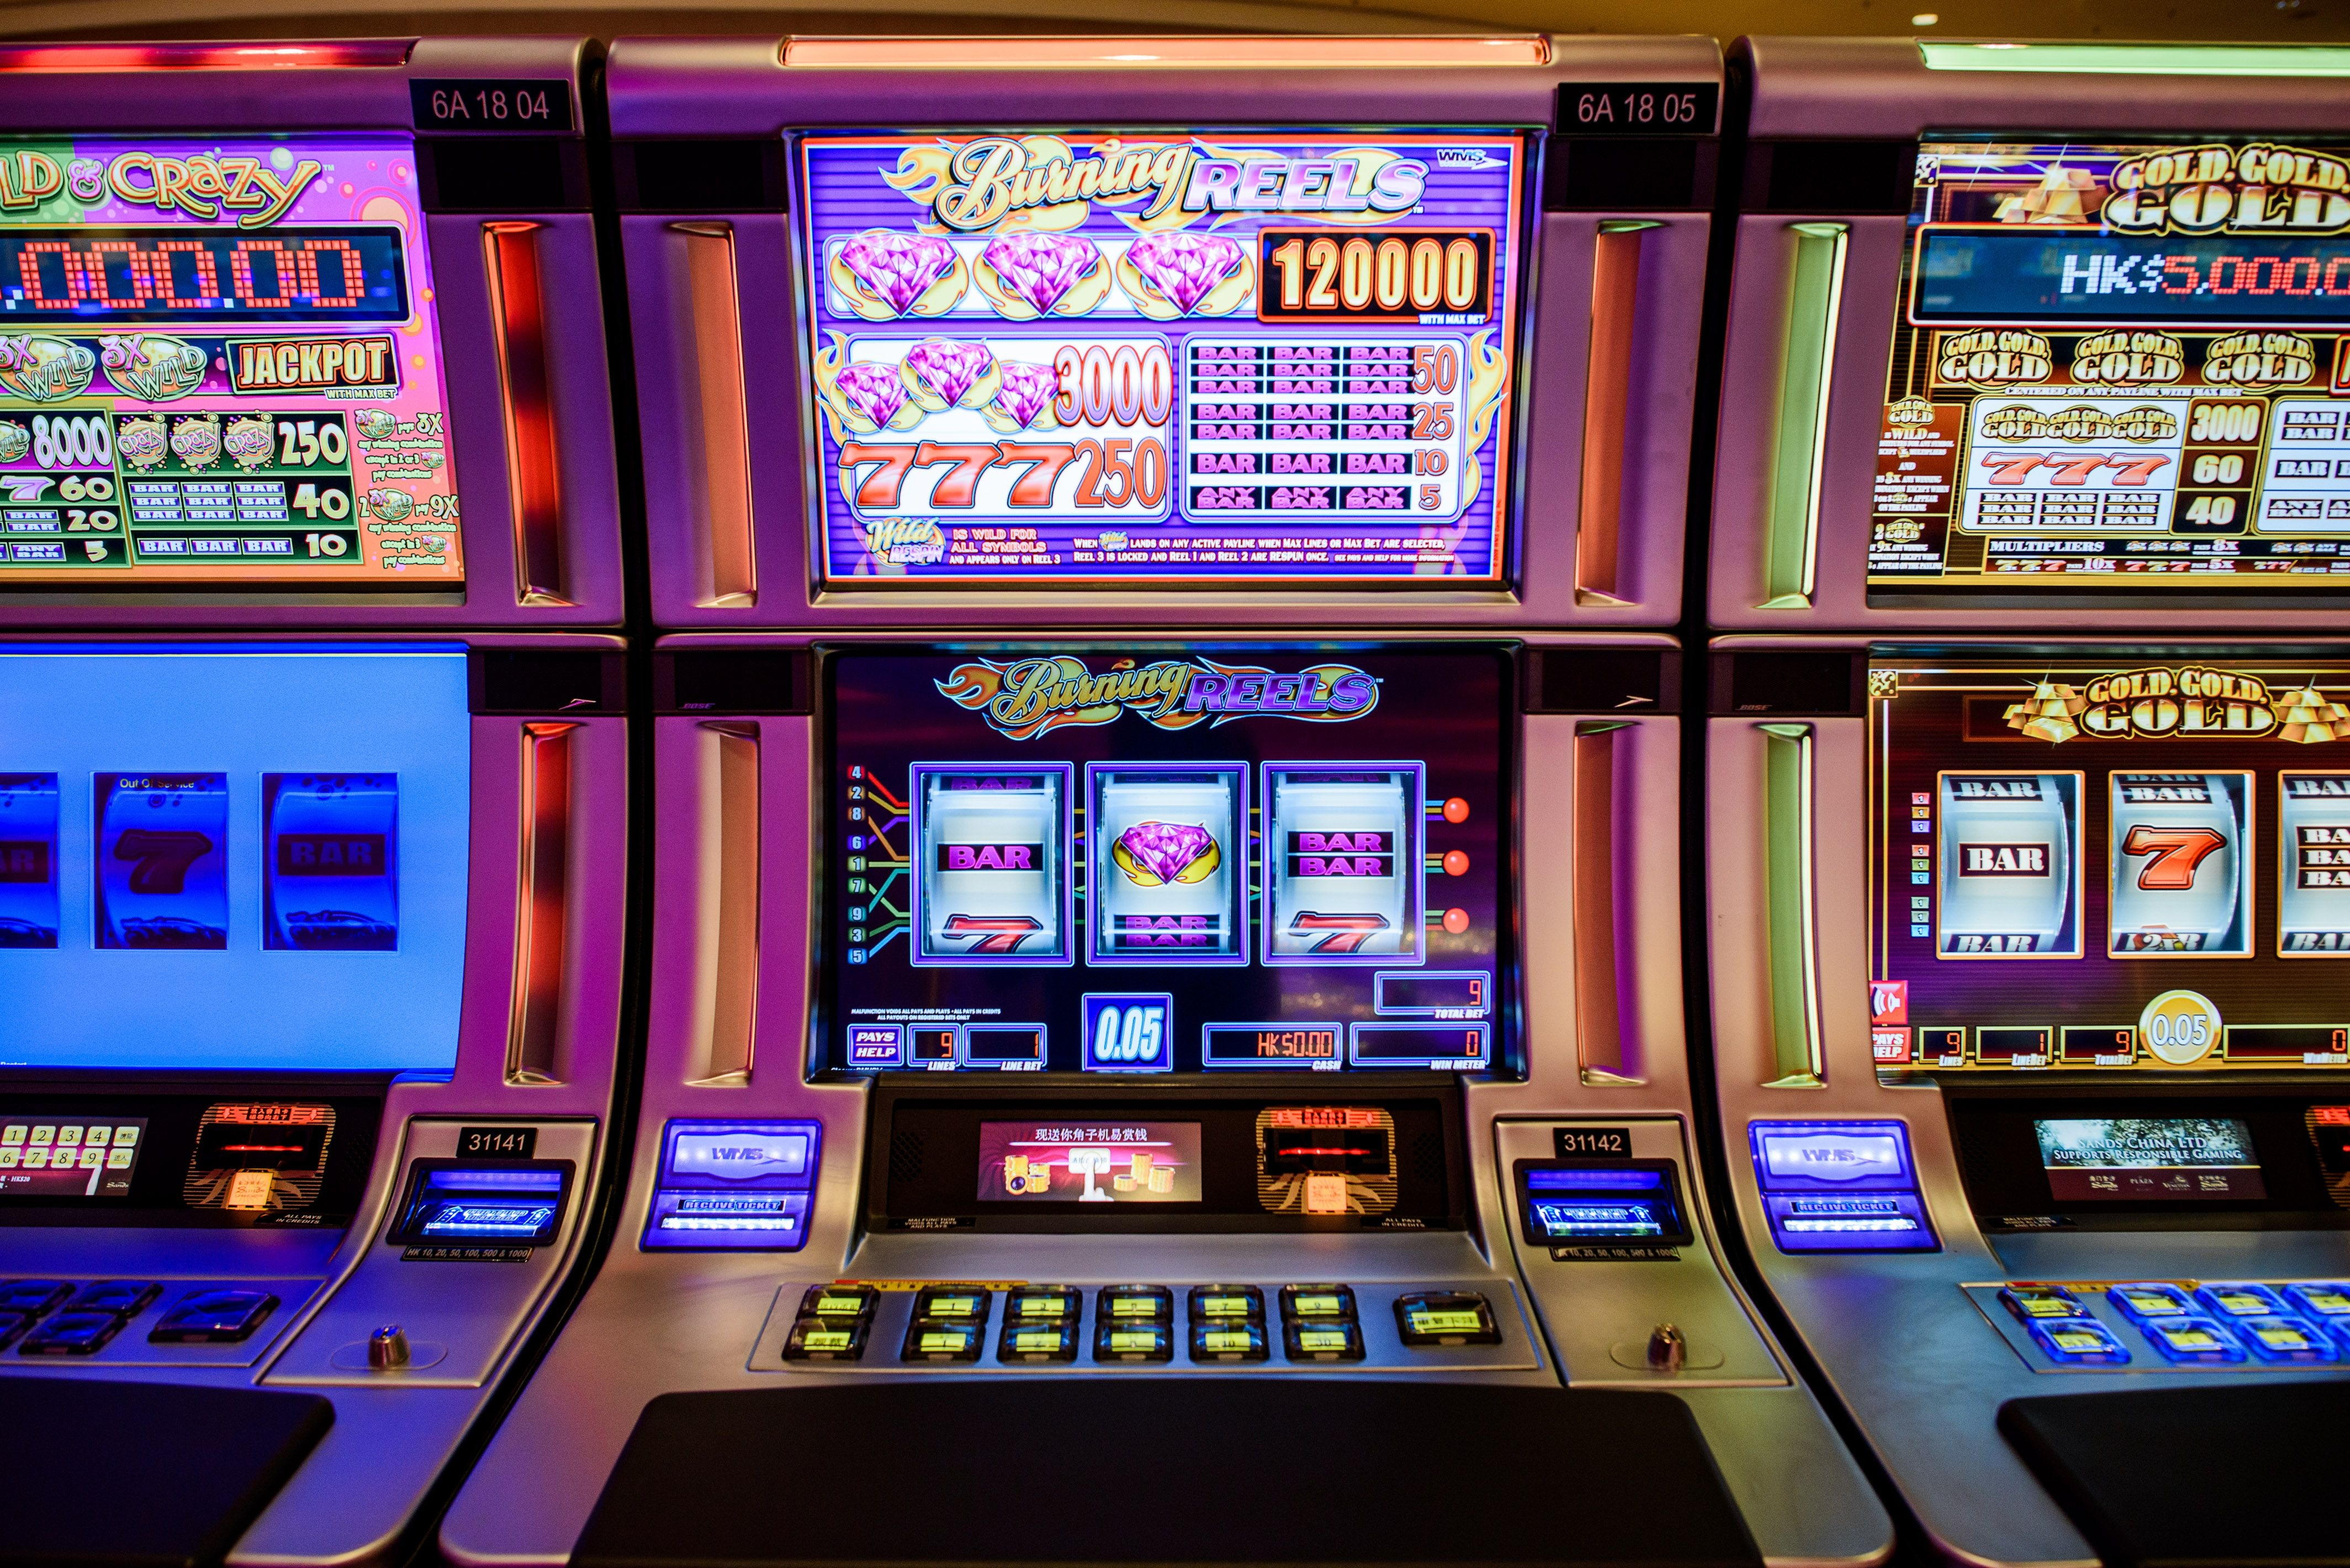 525% Match at a Casino at Casino com